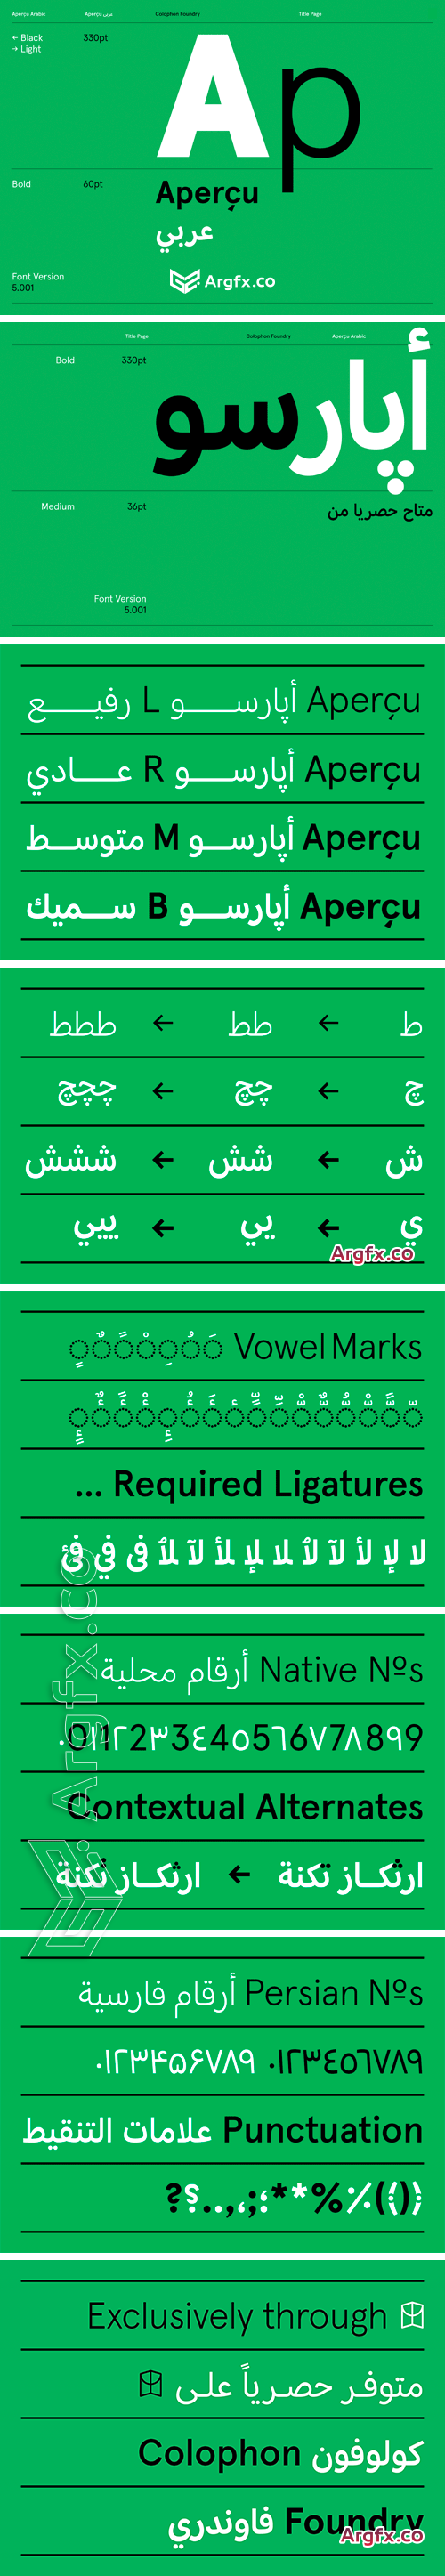 Apercu Arabic Font Family